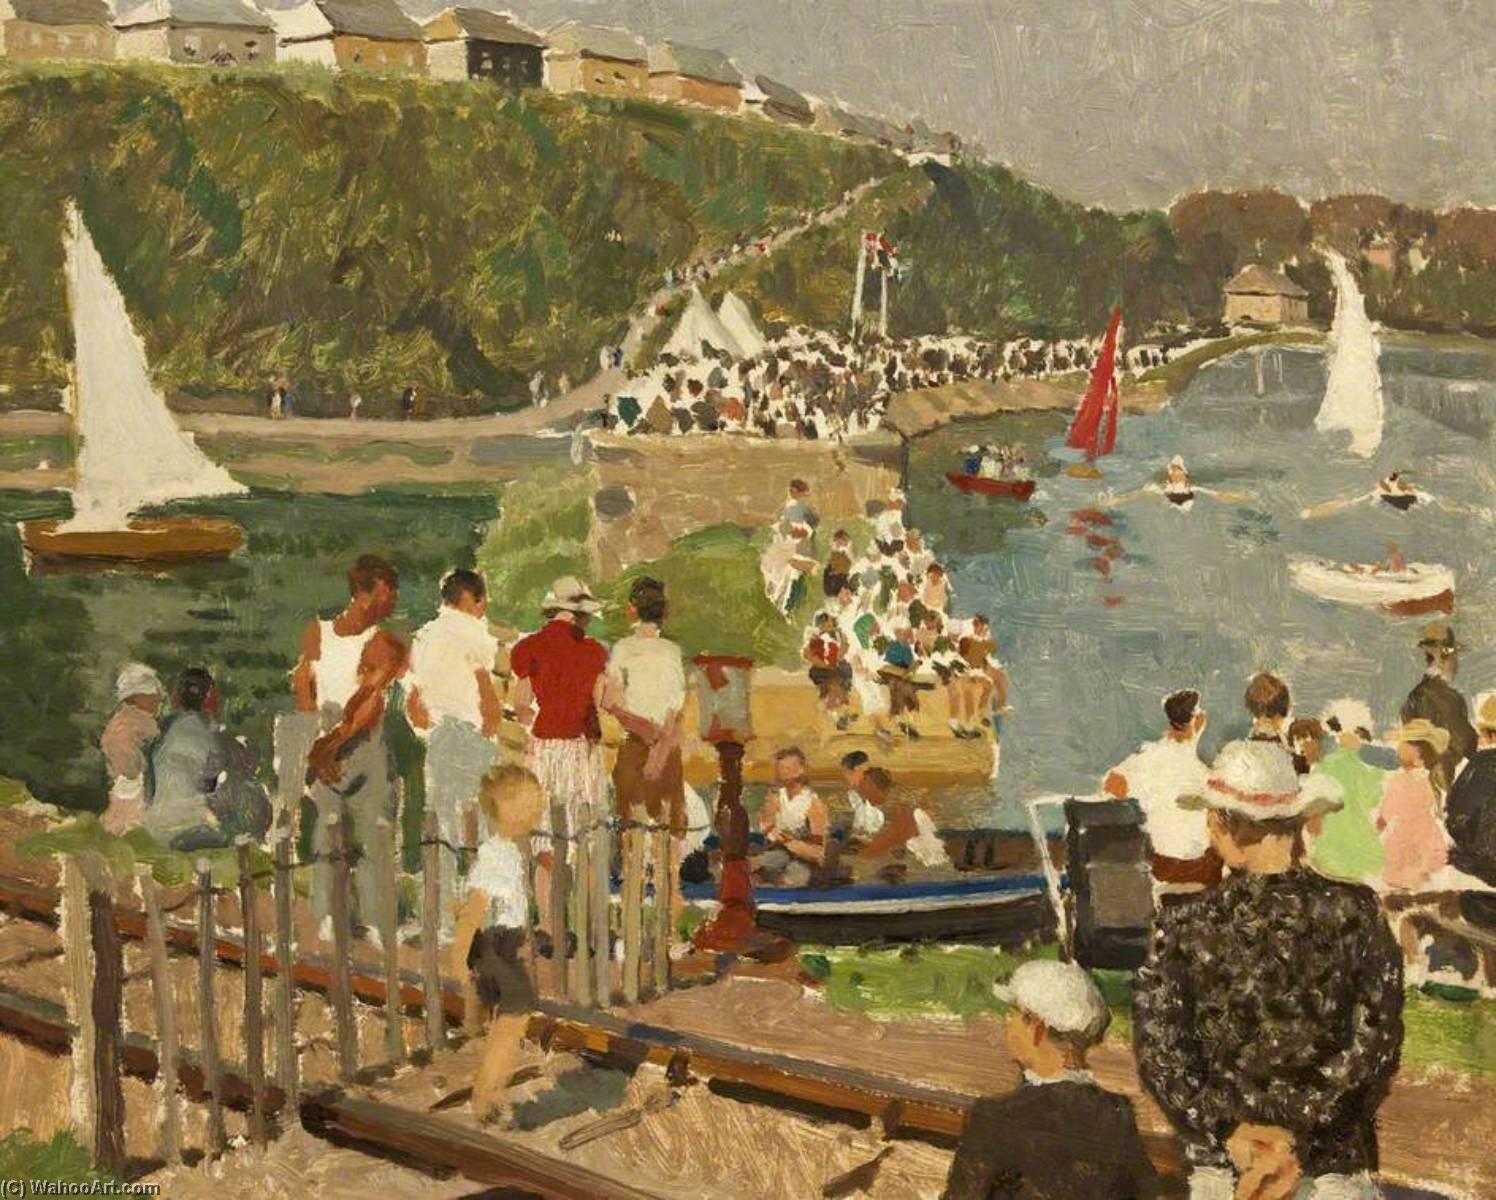 Wikioo.org - The Encyclopedia of Fine Arts - Painting, Artwork by Alethea Garstin - Regatta Day